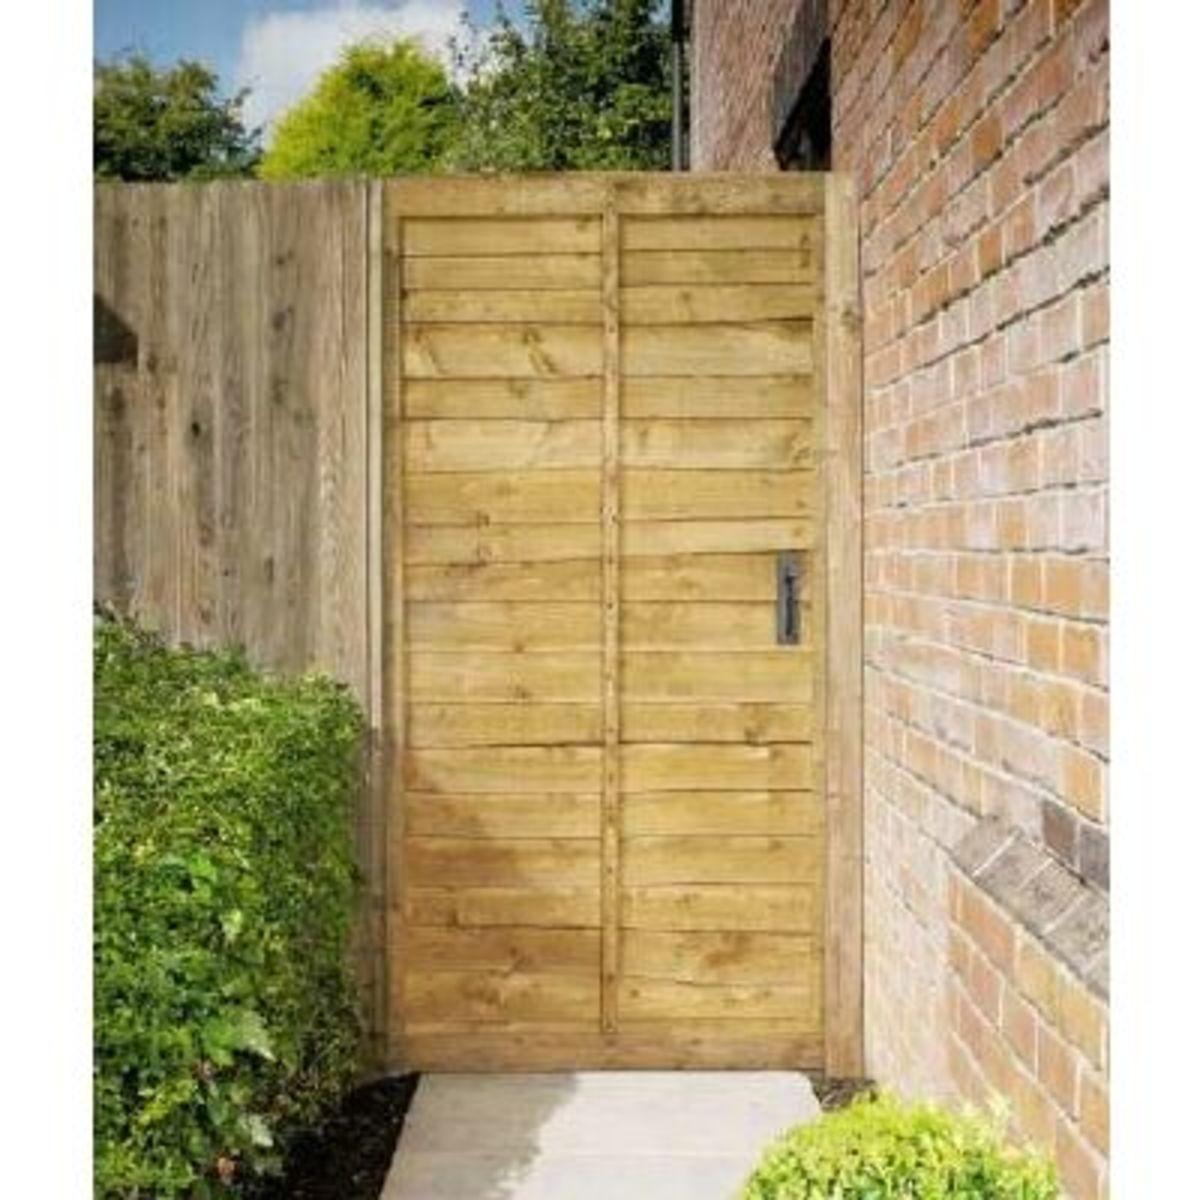 Wooden gates - Tall single side entrance wooden gates - Waney lap gate